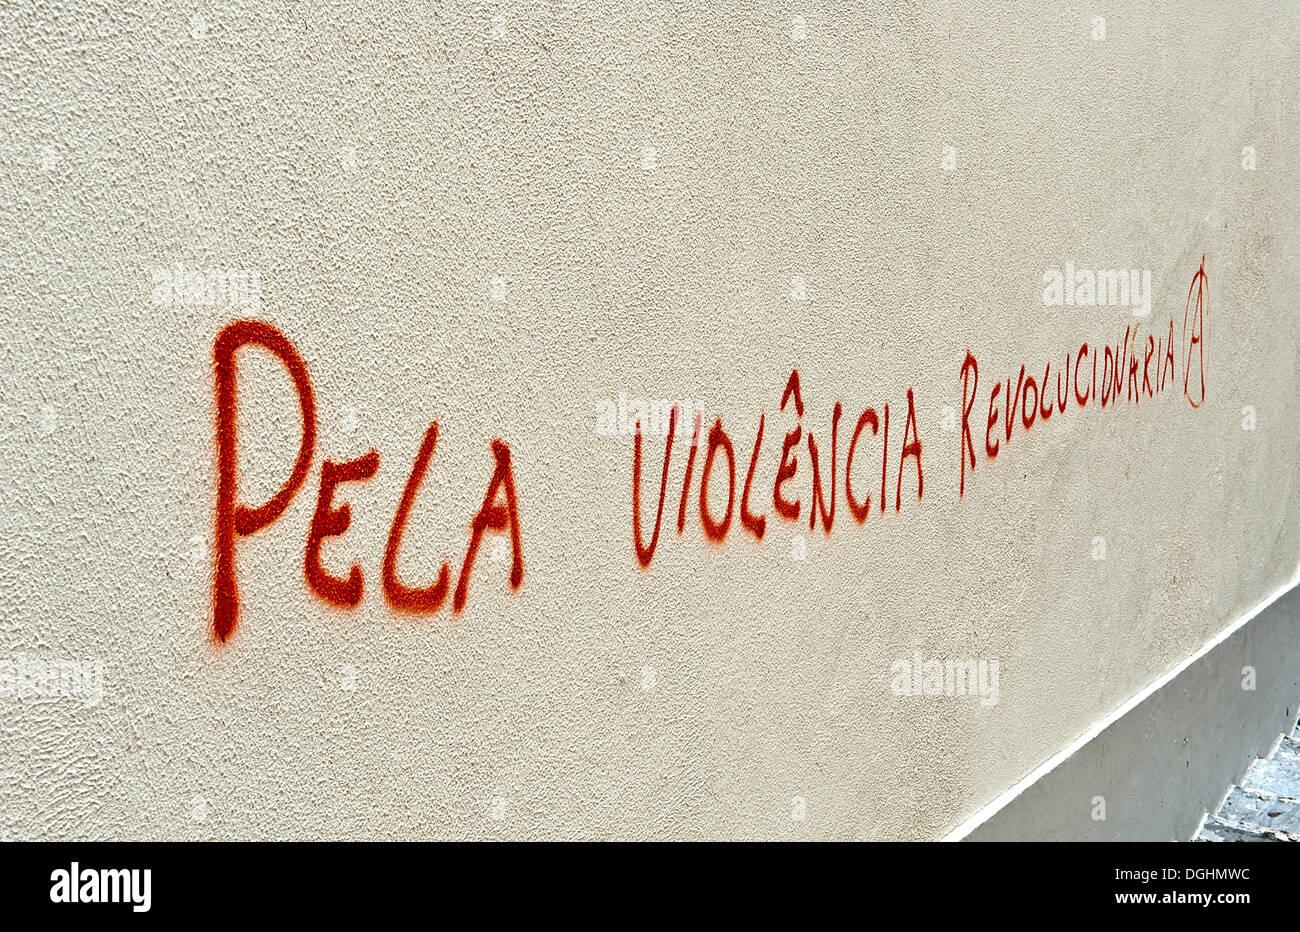 Anarchist writing 'for revolutionary violence', Alfama district, Lisbon, Portugal, Europe - Stock Image